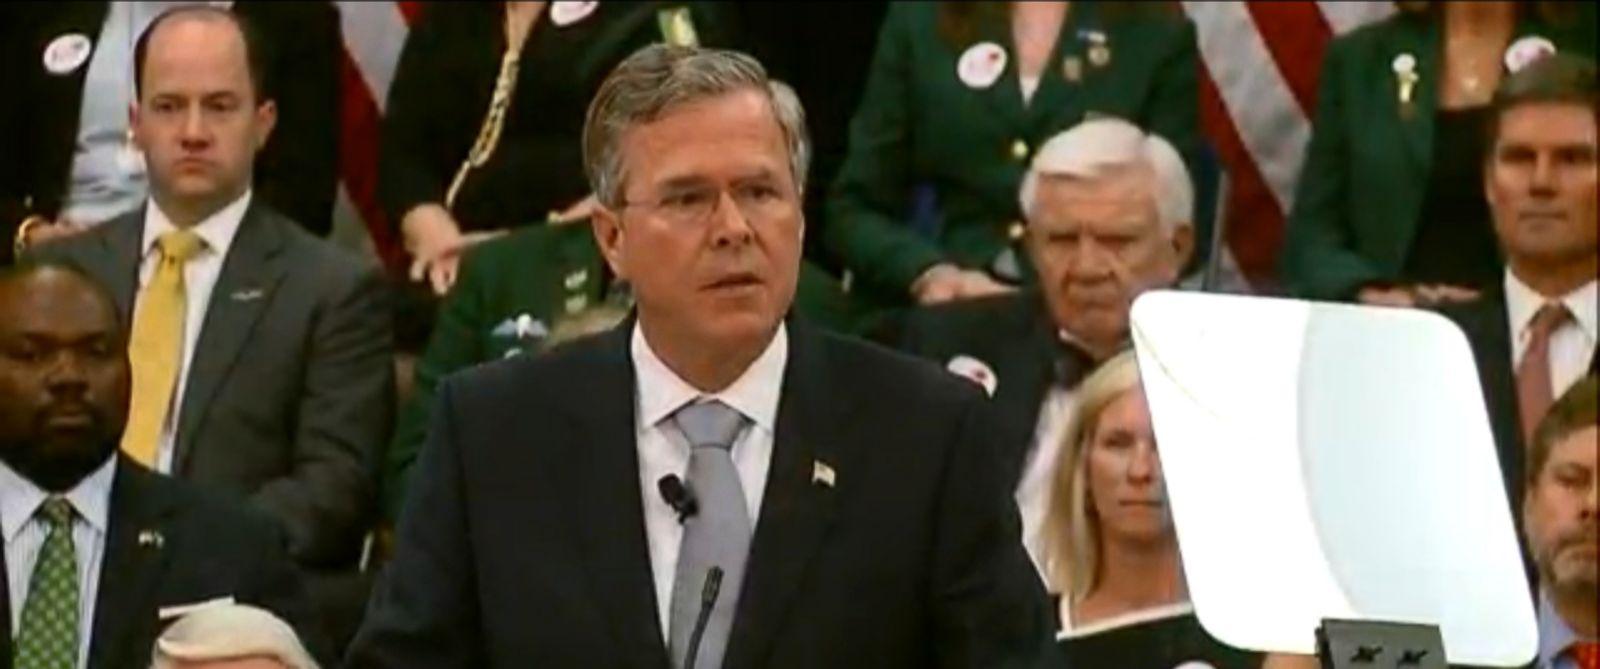 PHOTO:Jeb Bush delivers a speech at The Citadel, The Military College of South Carolina, Nov. 18, 2015.